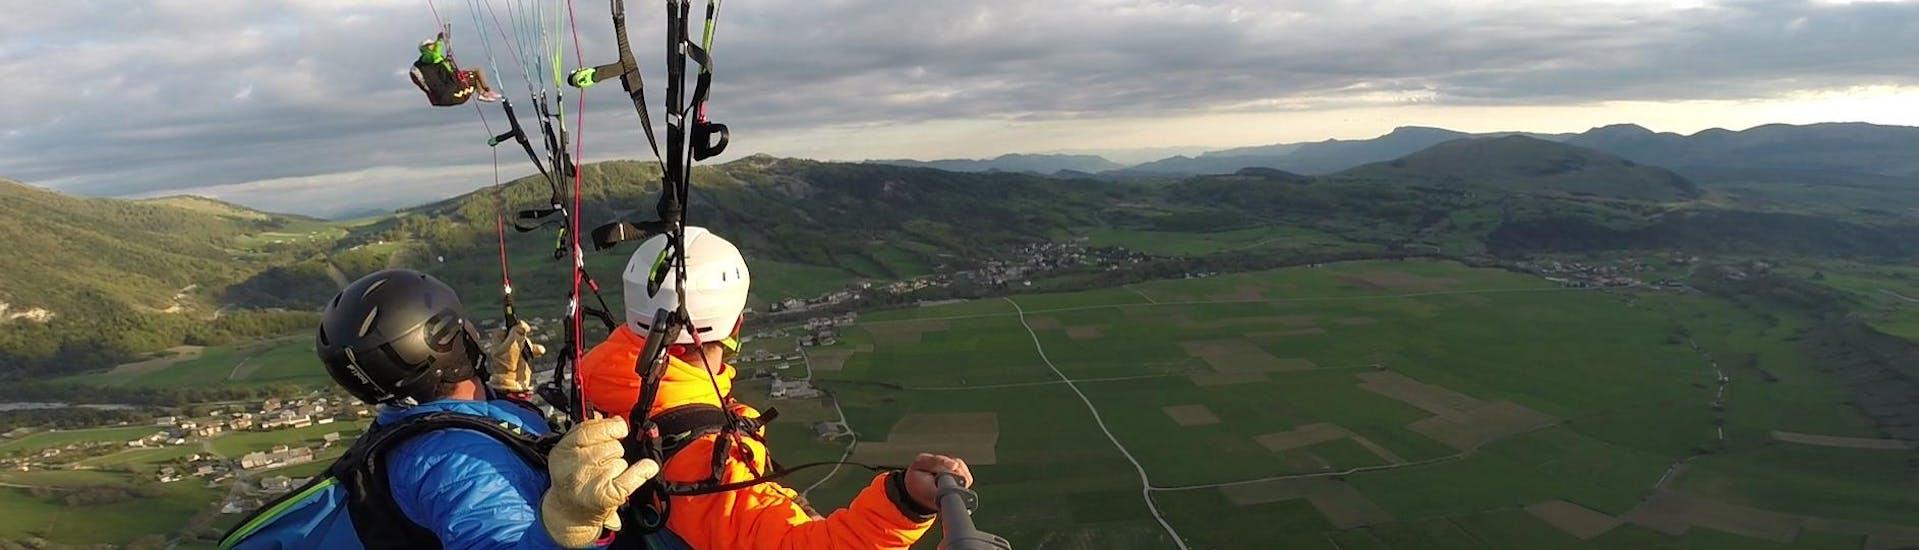 "Tandem Paragliding ""Discovery"" - Barre des Ecrins"